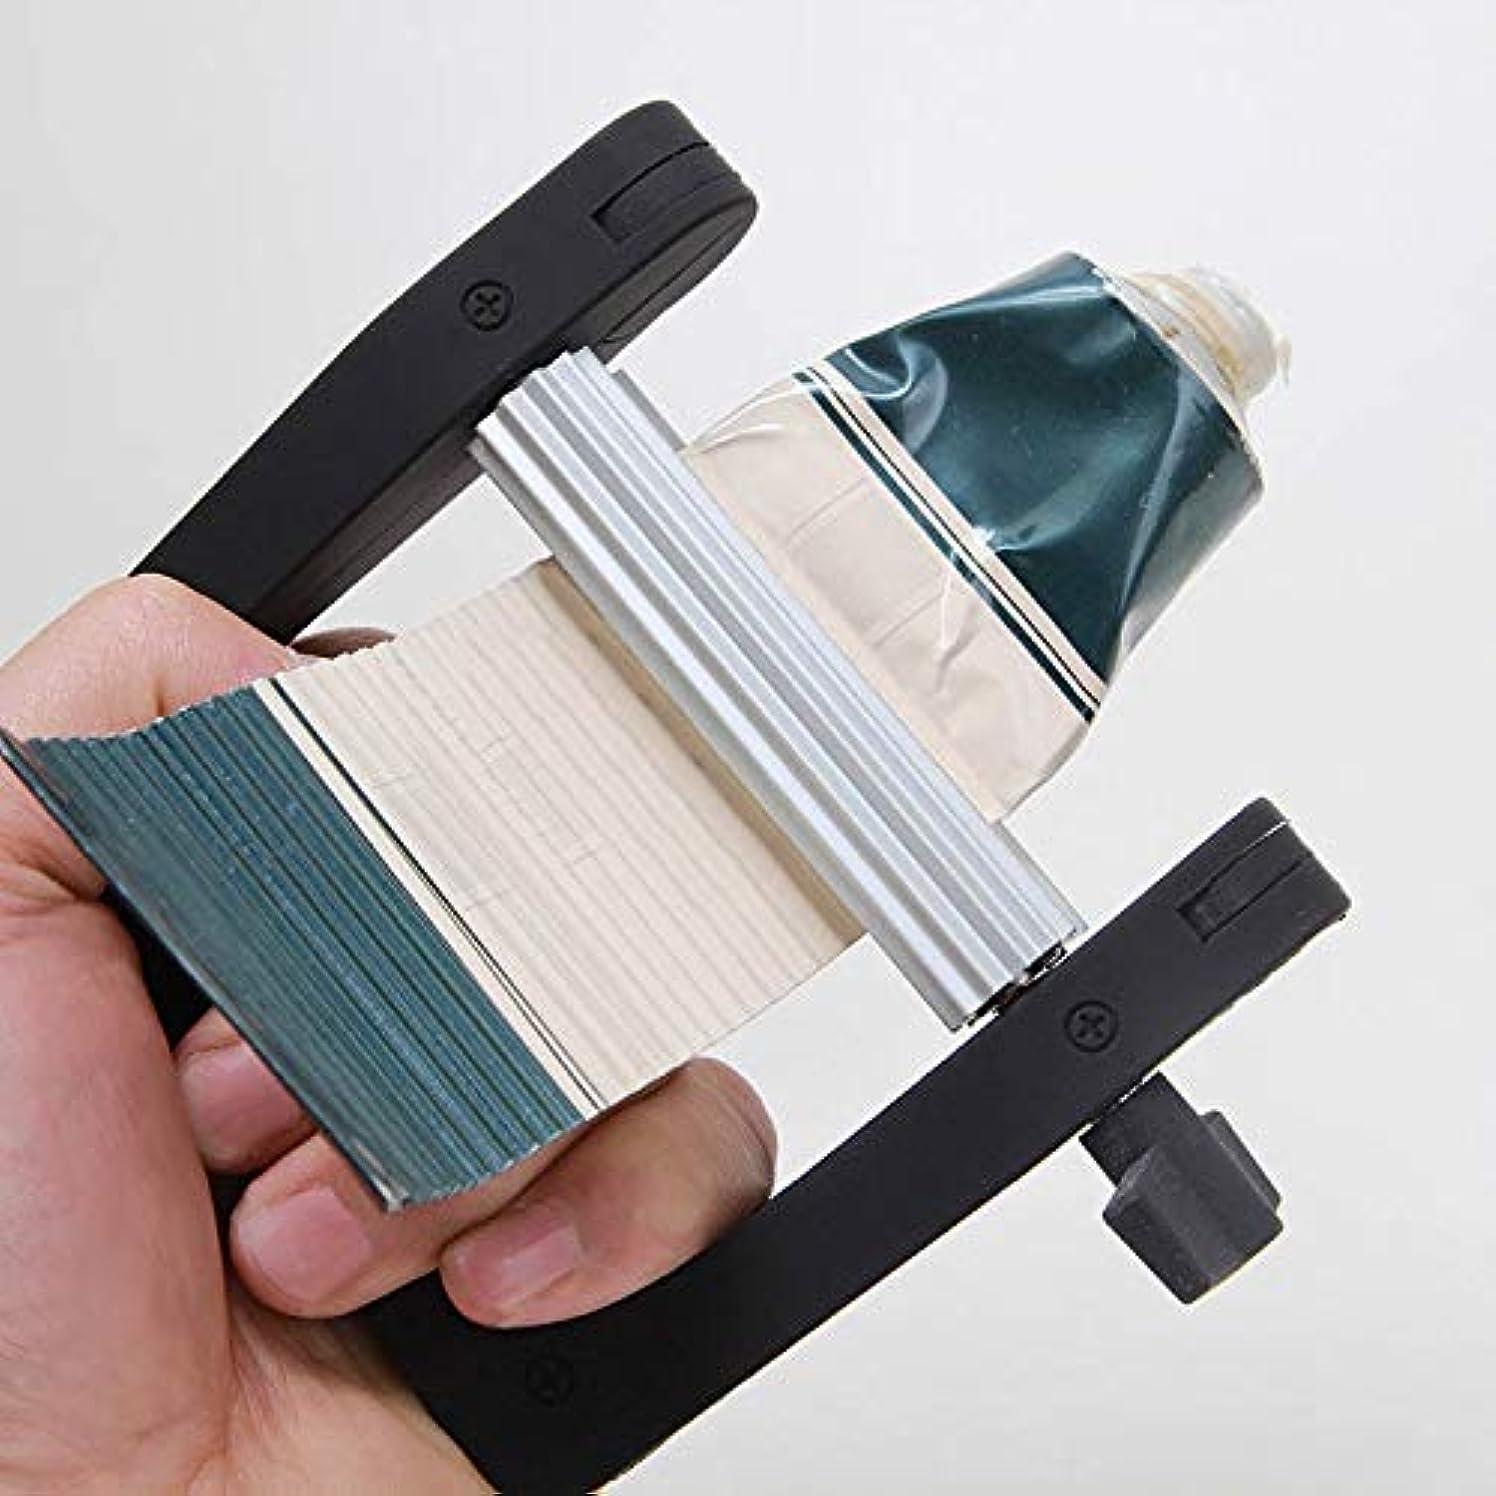 Storage Boxes & Bins - Multifunction Plastic Toothbrush Holder Portable Toothpaste Dispenser Squeezer Bathroom - Storage Bins Boxes